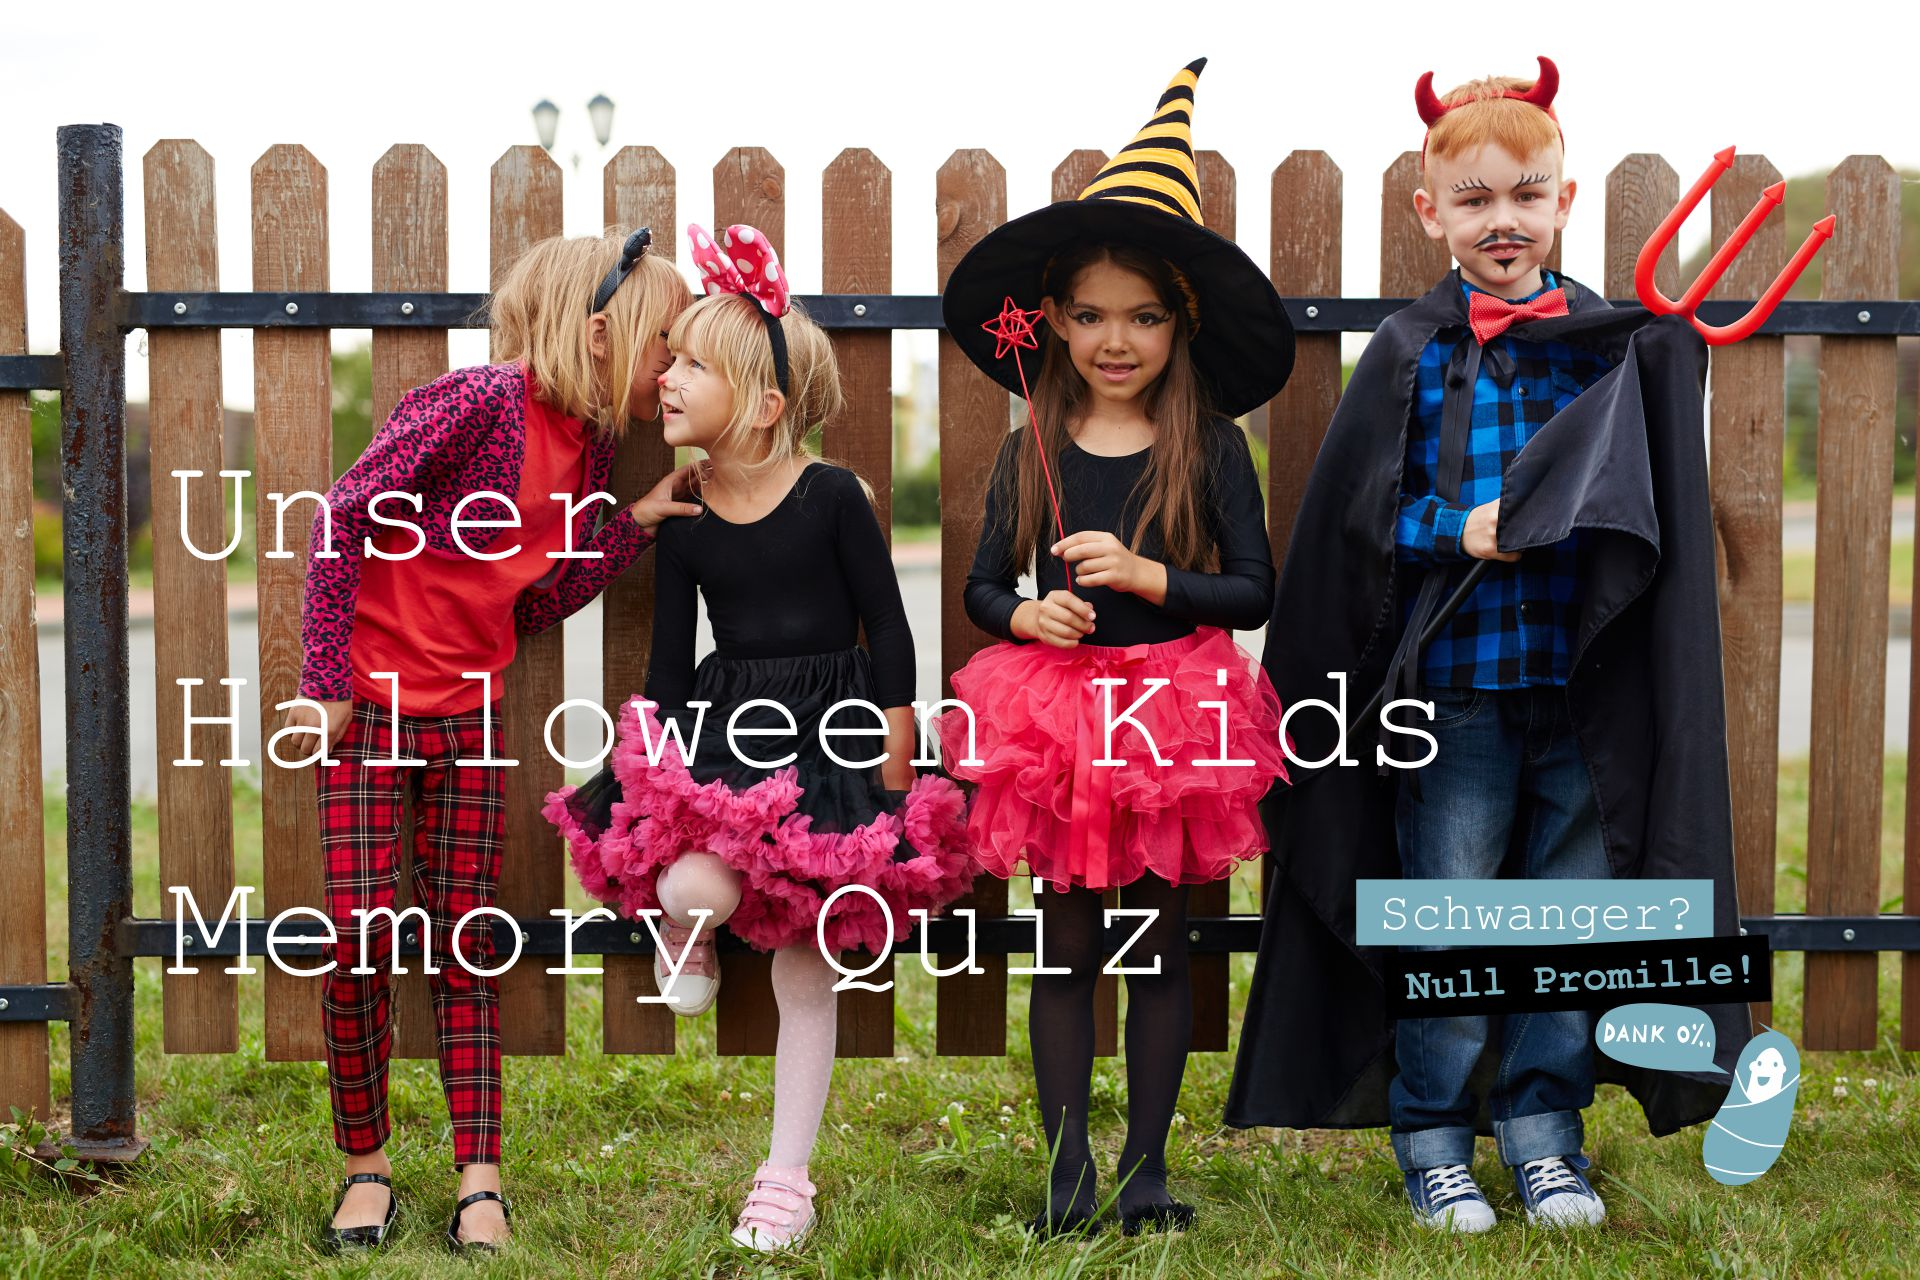 Schwanger-Null-Promille-Halloween-Kids-Memory-Quiz-Spiel